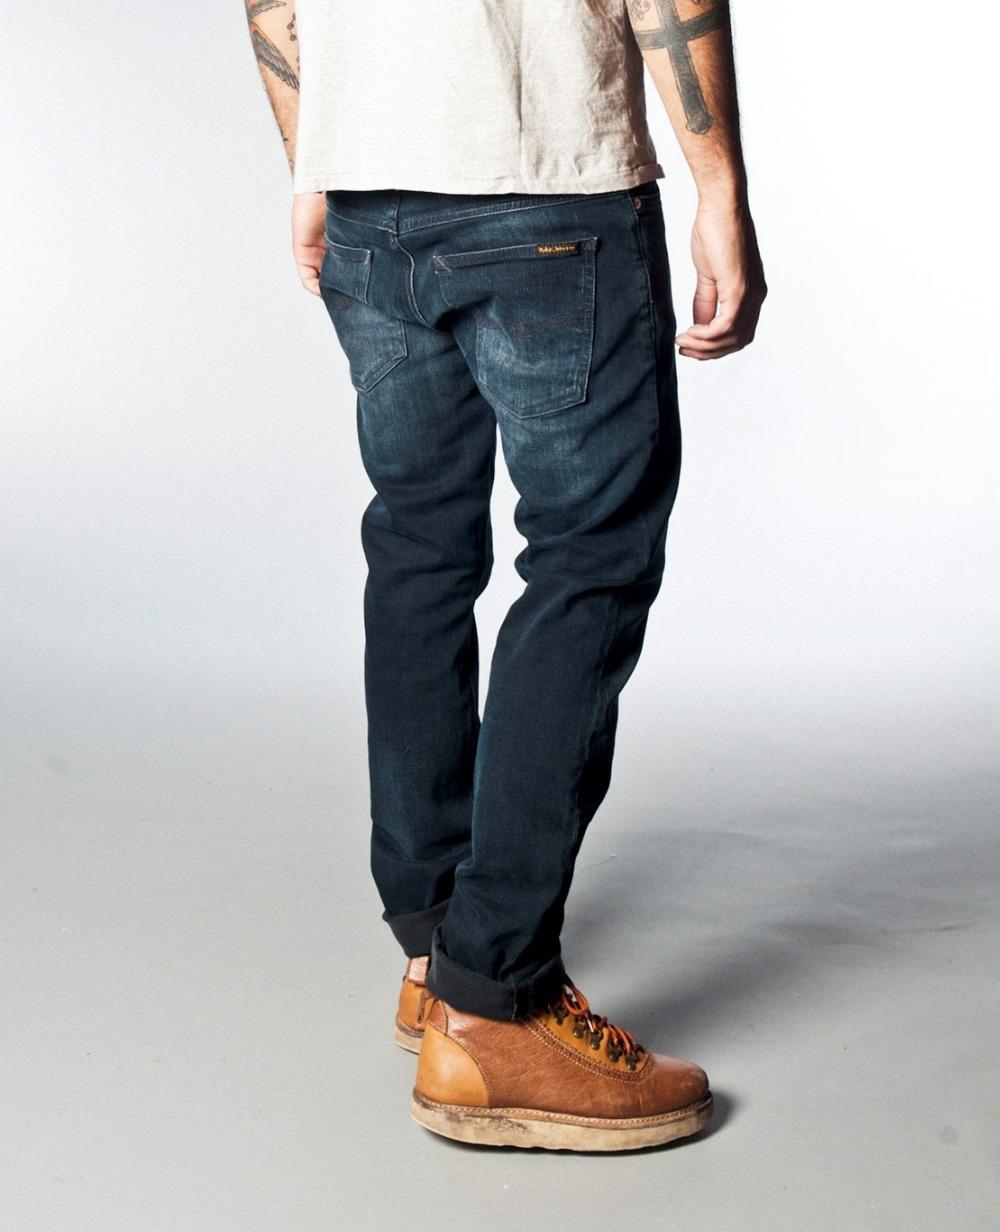 Odm Oem Custom Made New Style No Brand Fashion Men Jeans Skinny Denim Man Pant Jeans In Dubai ...